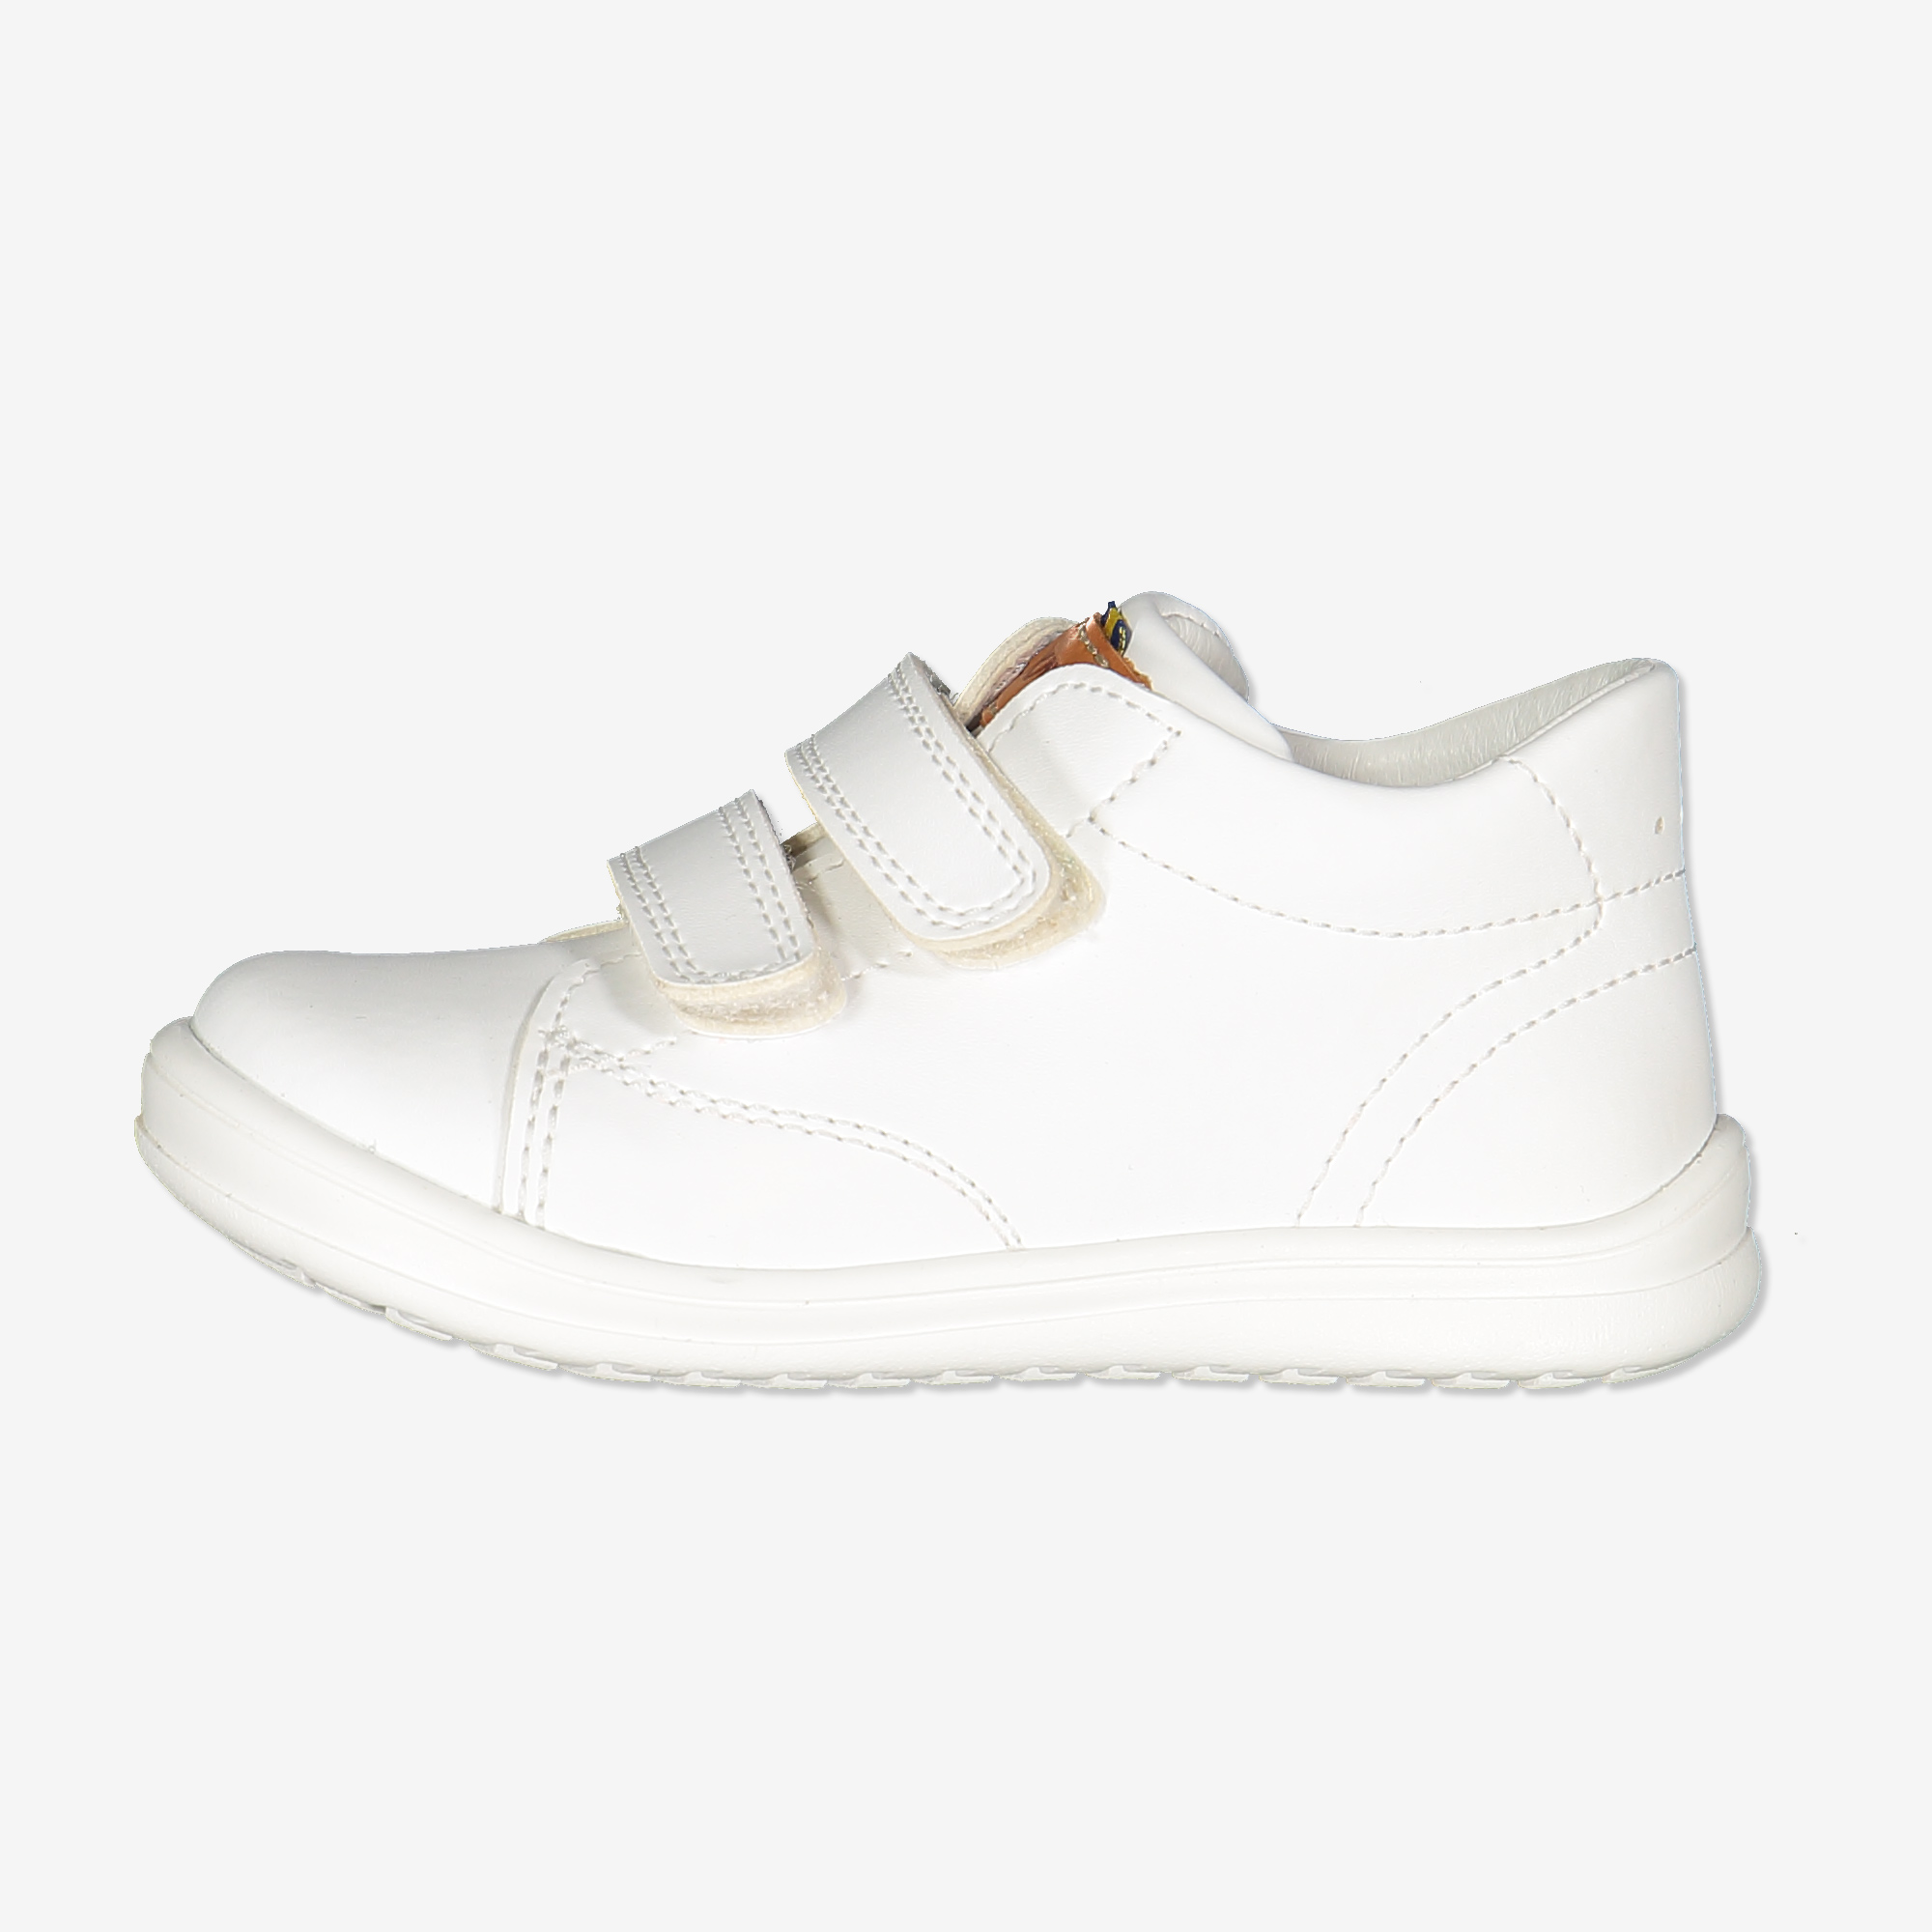 Sneaker kavat asko xc vit | Polarnopyret.se